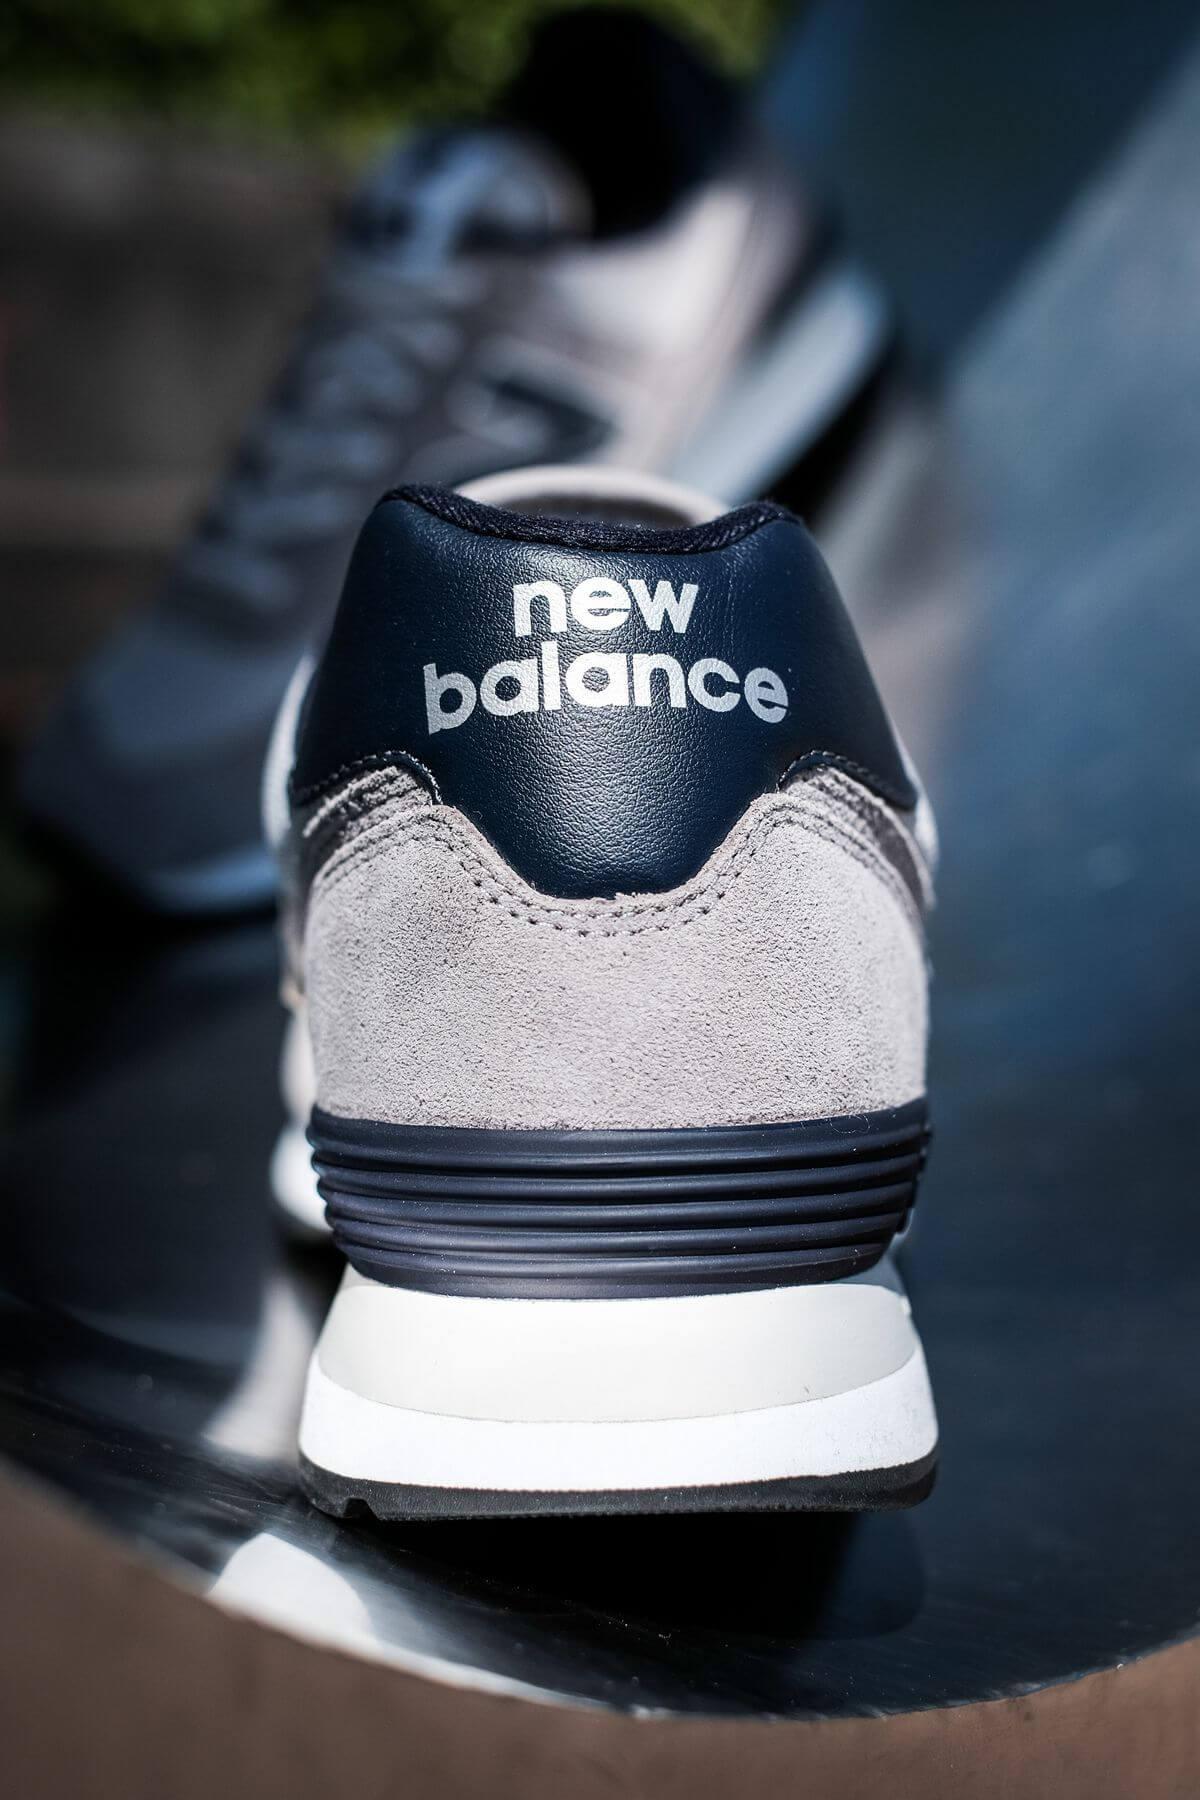 details heel part - New Balance - 574 History Class Pack - ML574BE2 - grey/navy